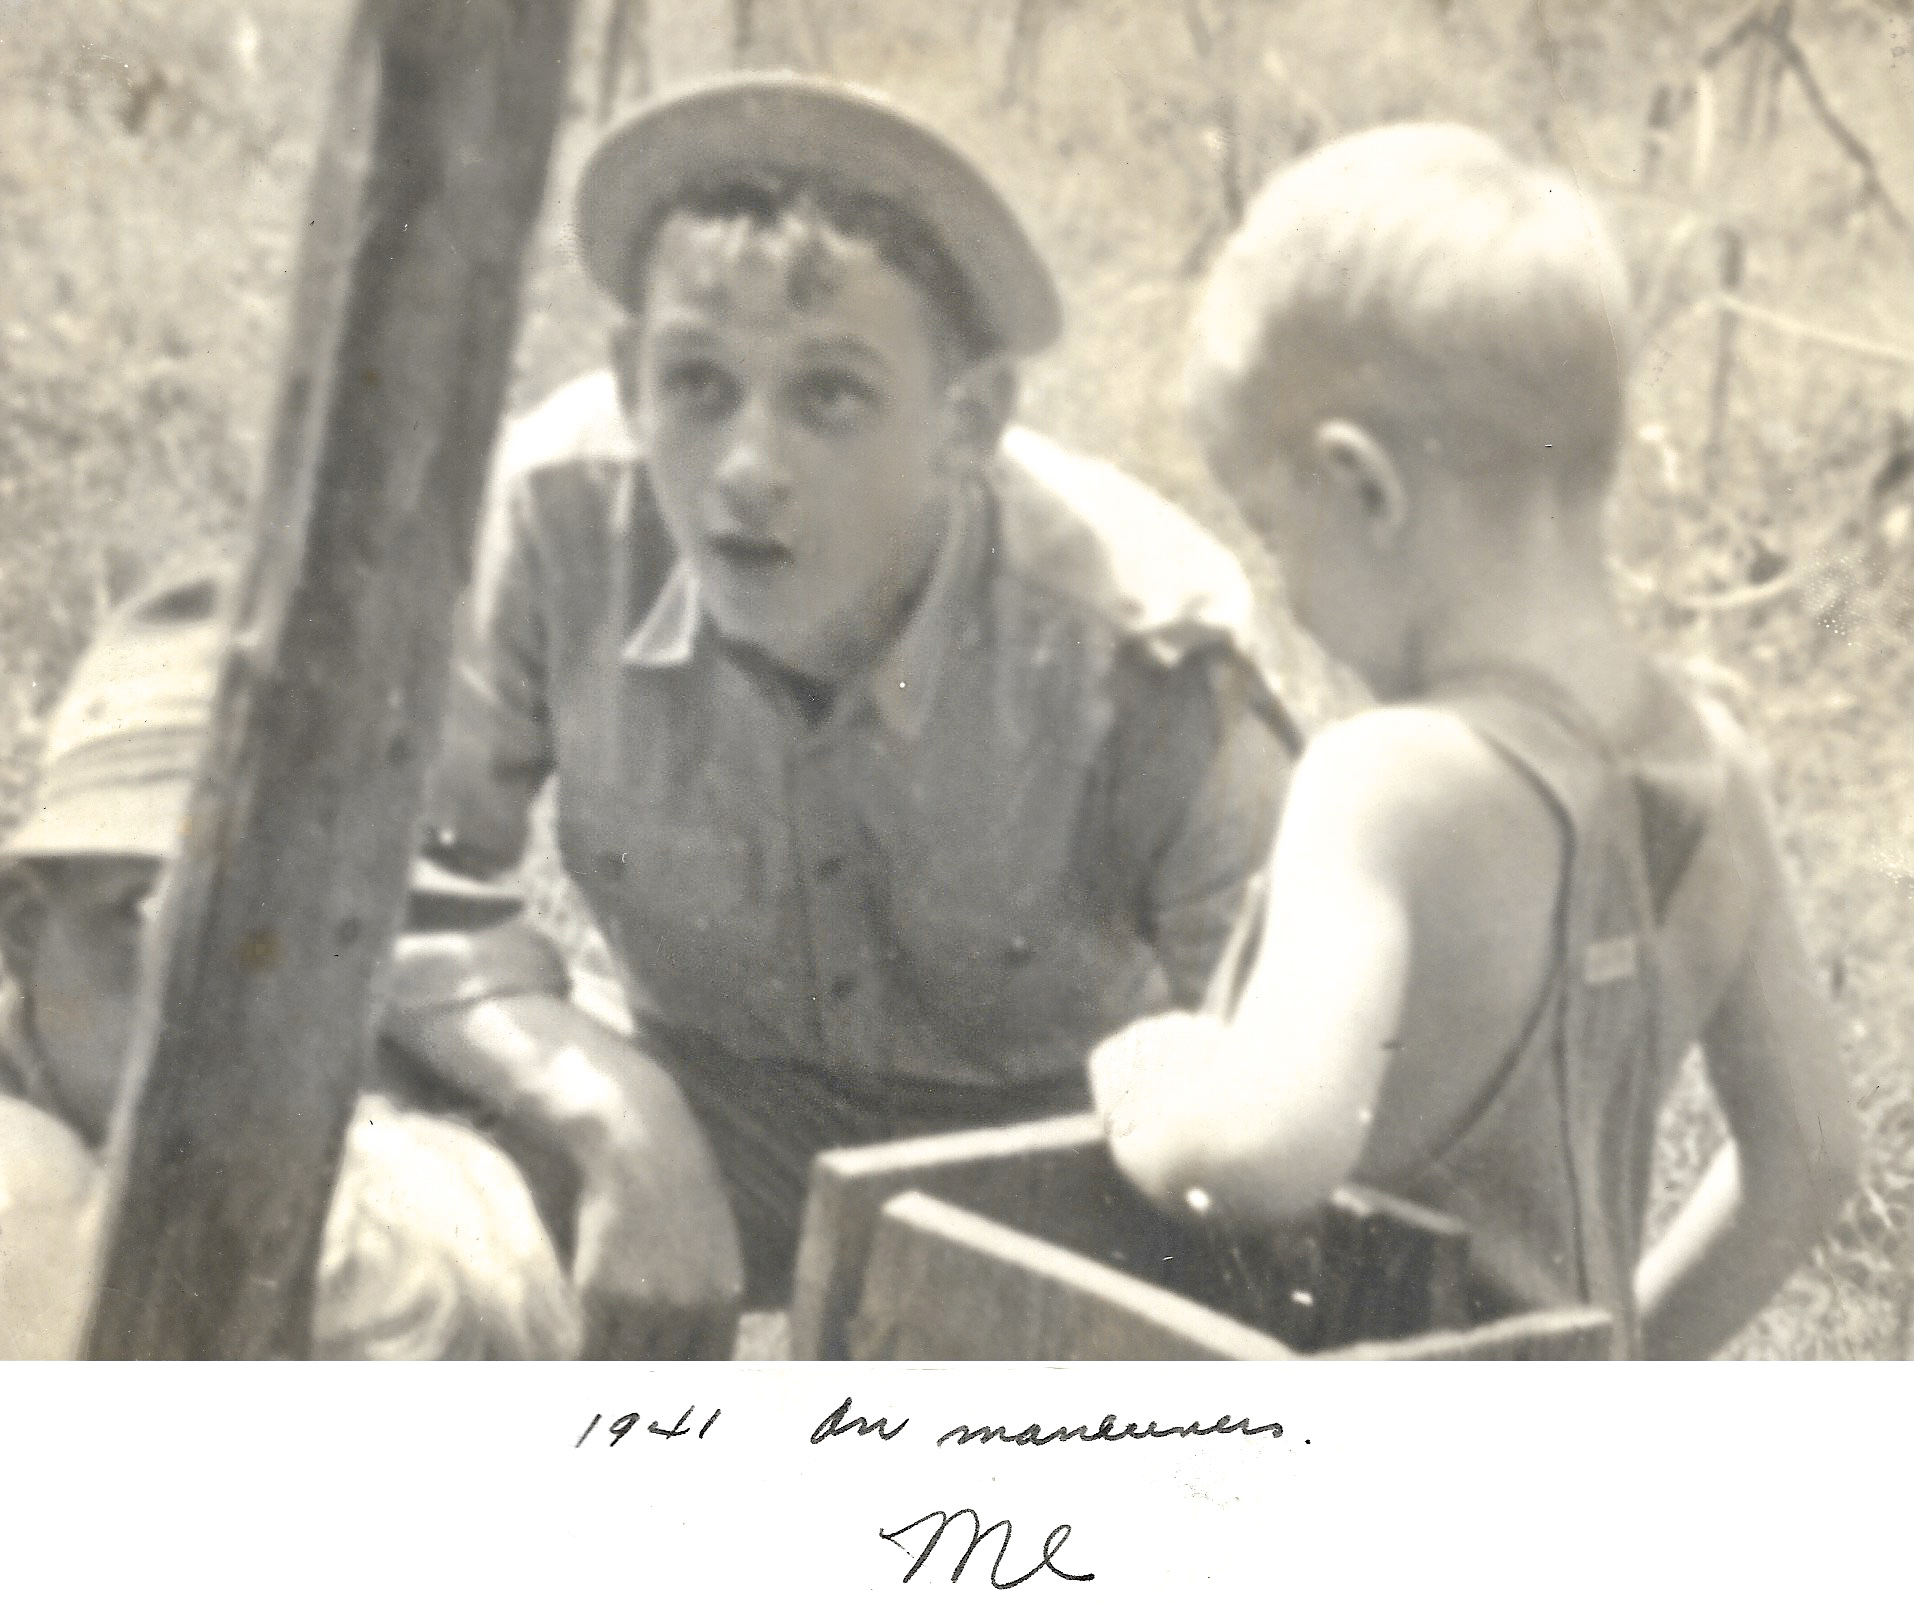 1941 WWII, Ernie Faulkner, Louisiana Maneuvers